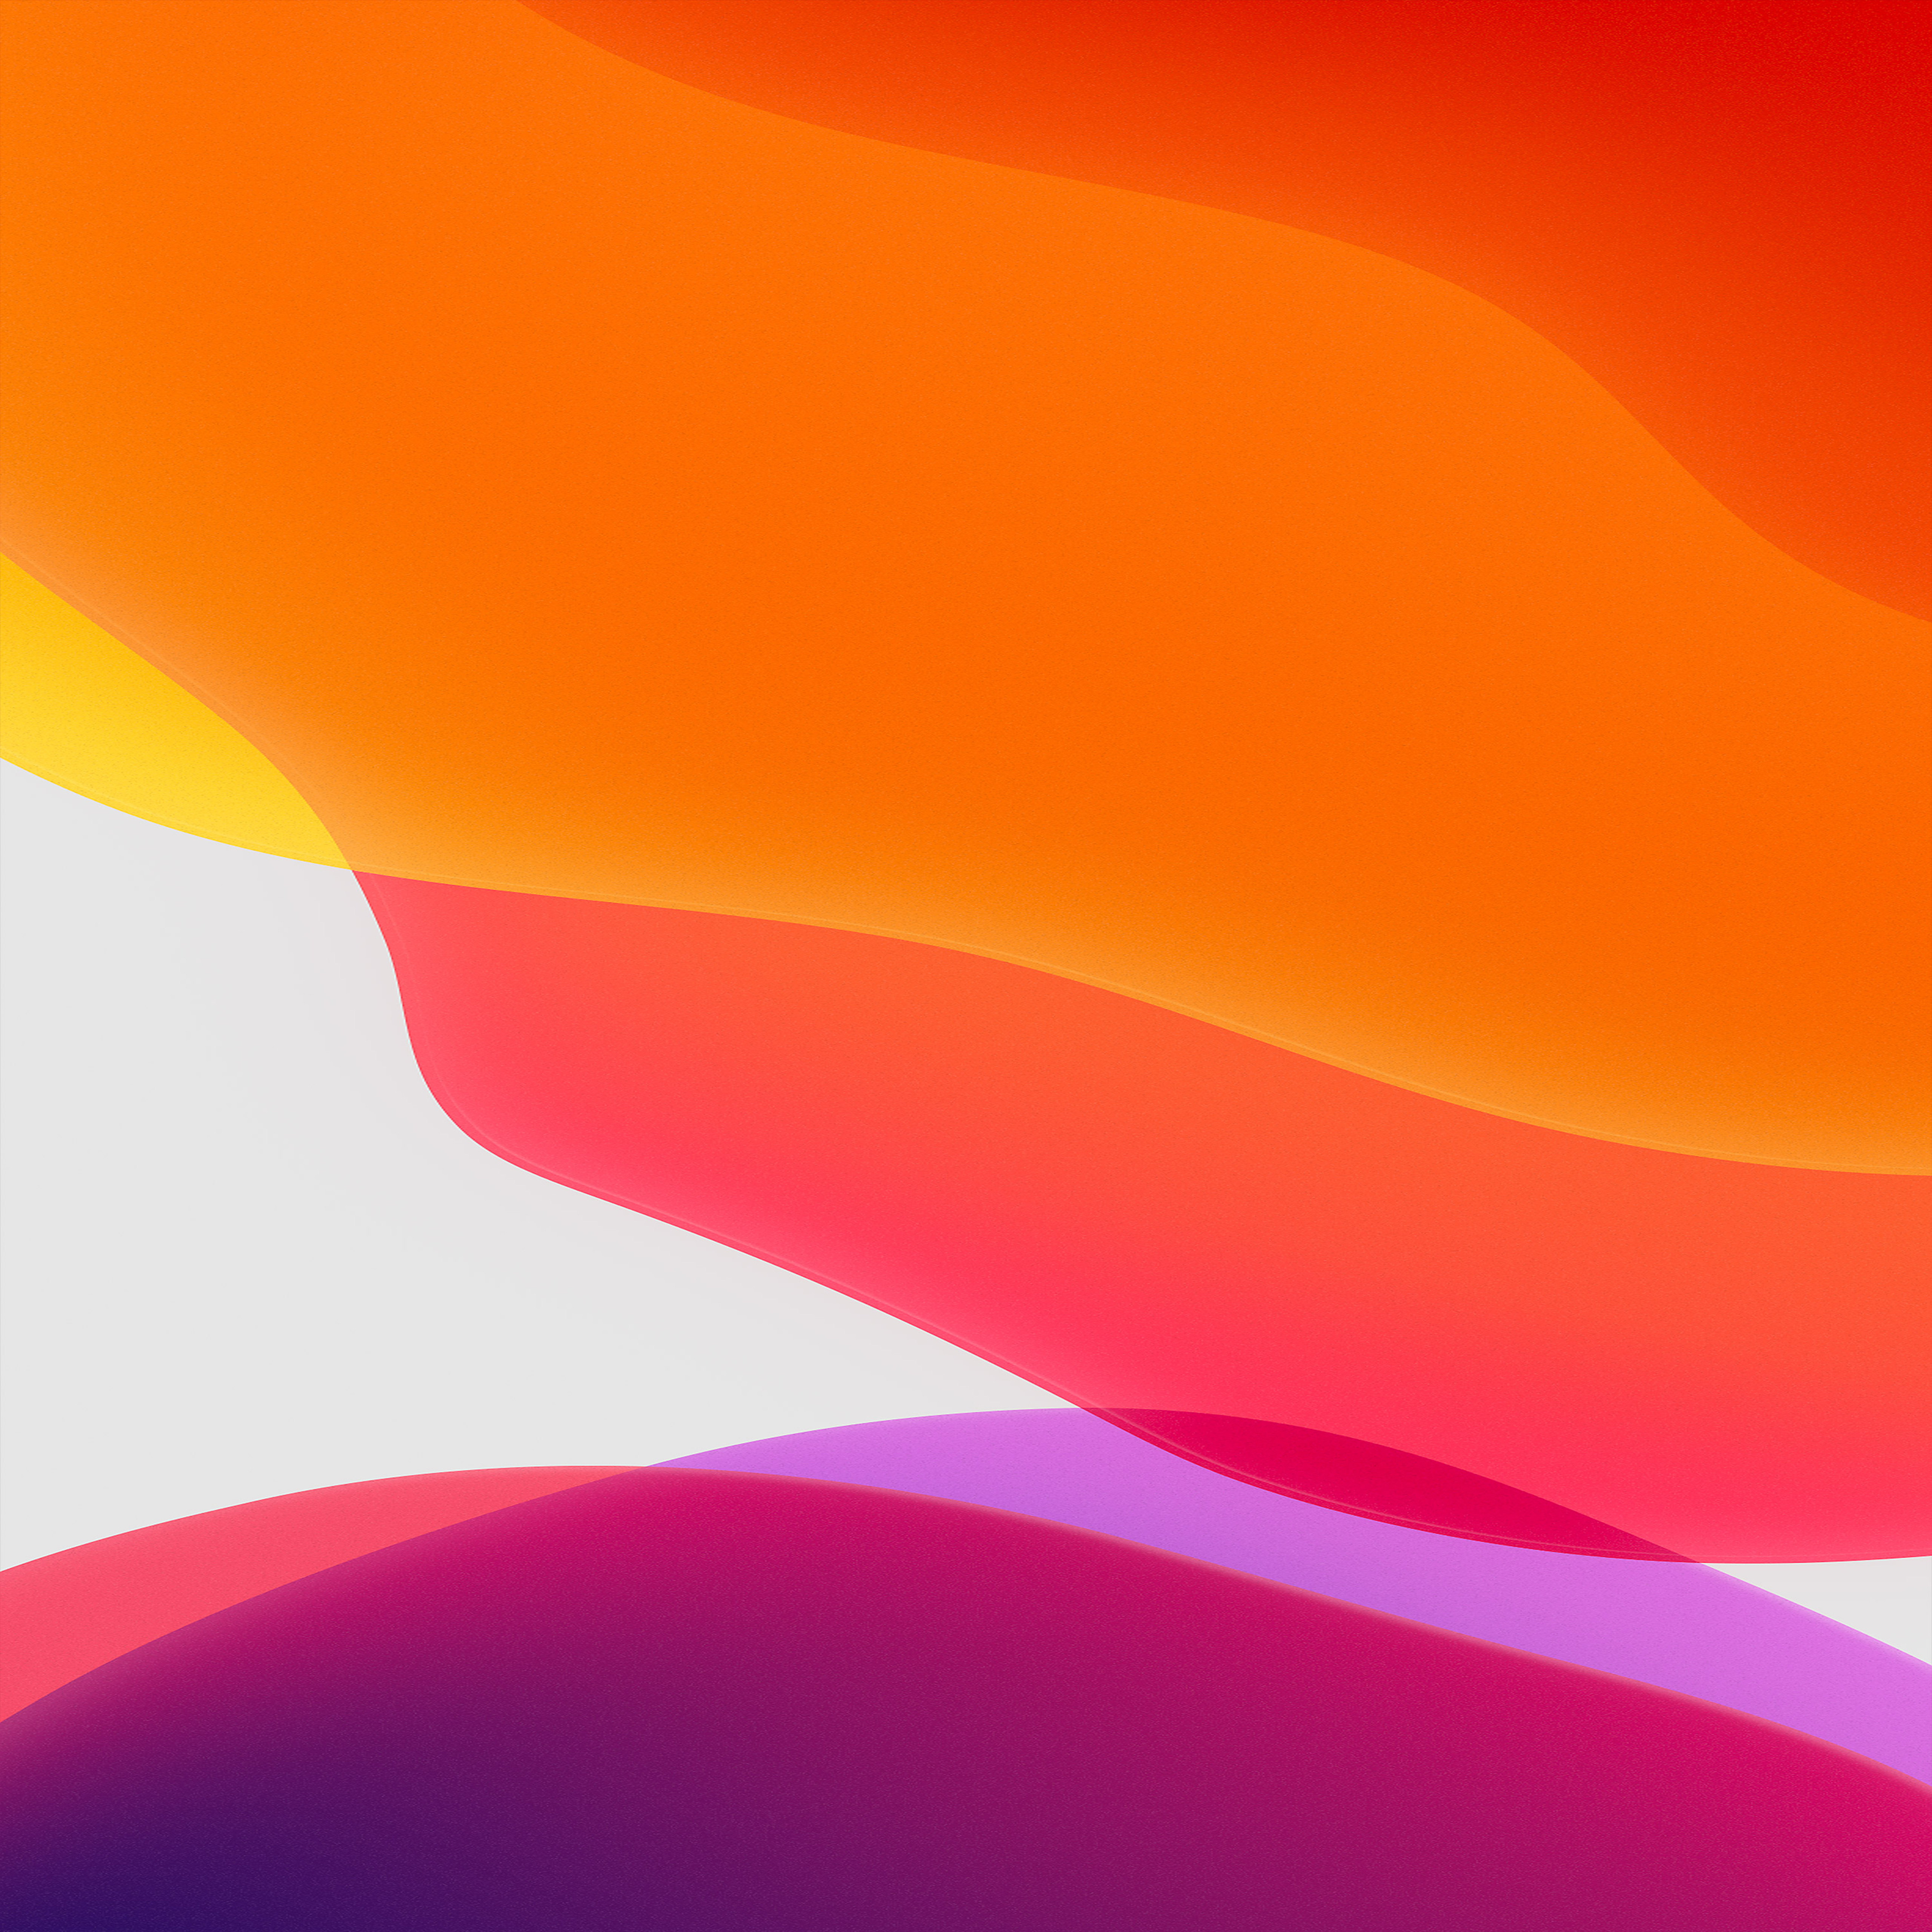 papers.co bj42 apple iphone ios13 background orange art 40 wallpaper